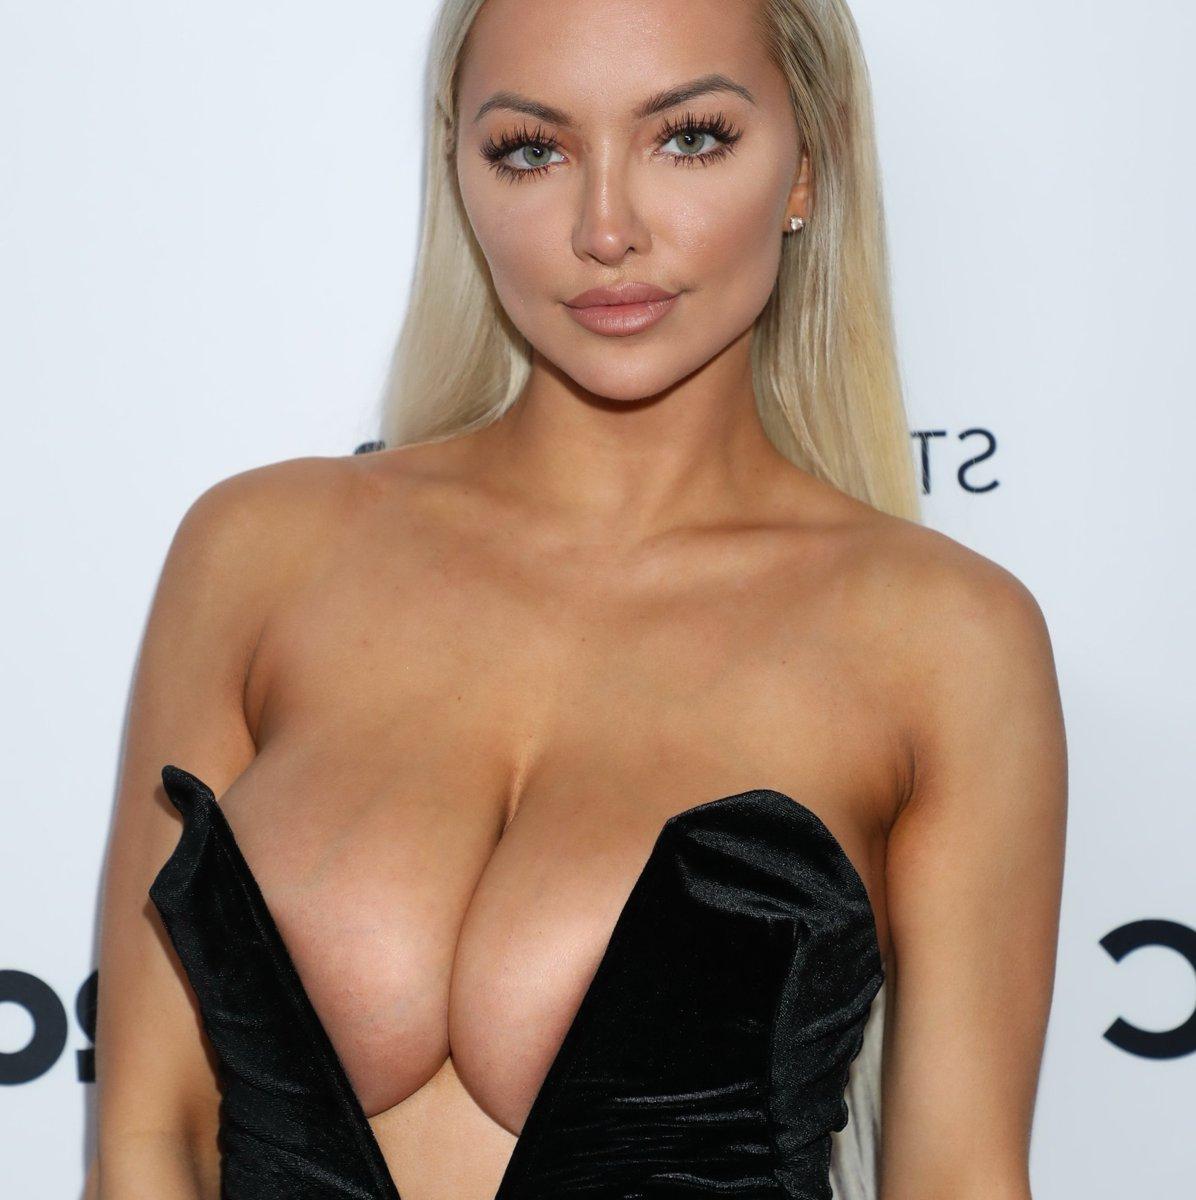 Most famous tits